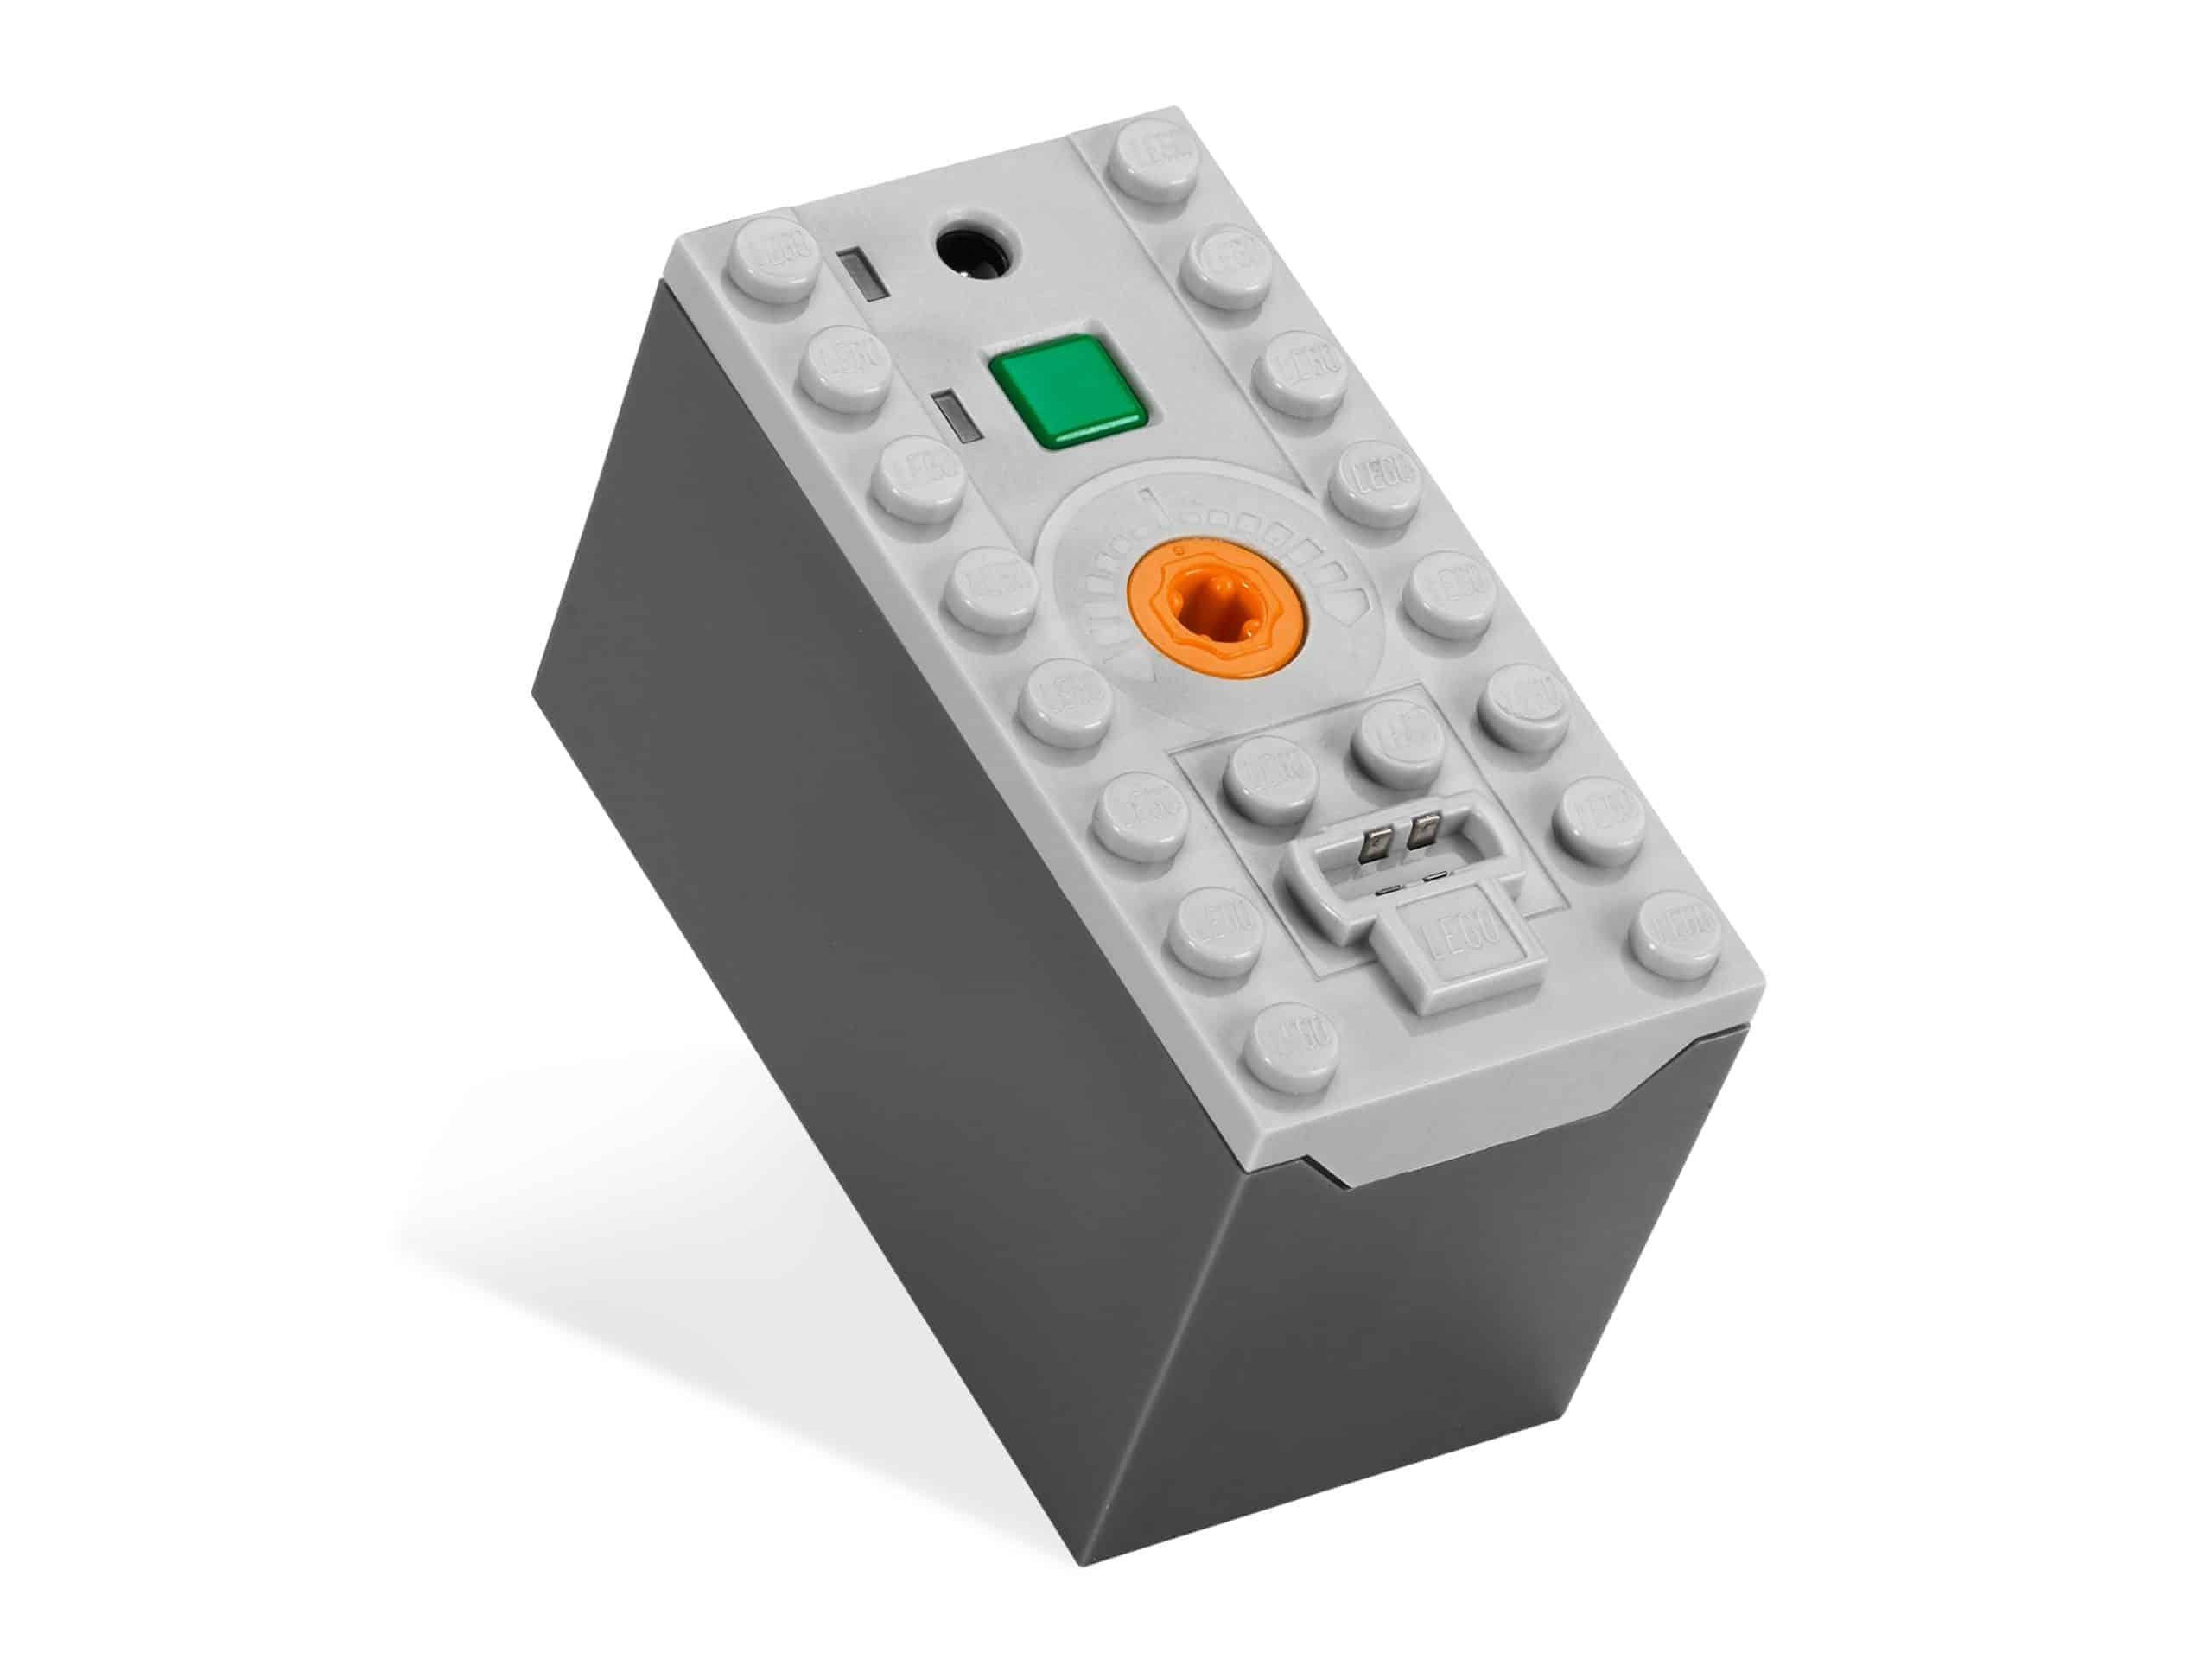 lego 8878 power functions akku scaled